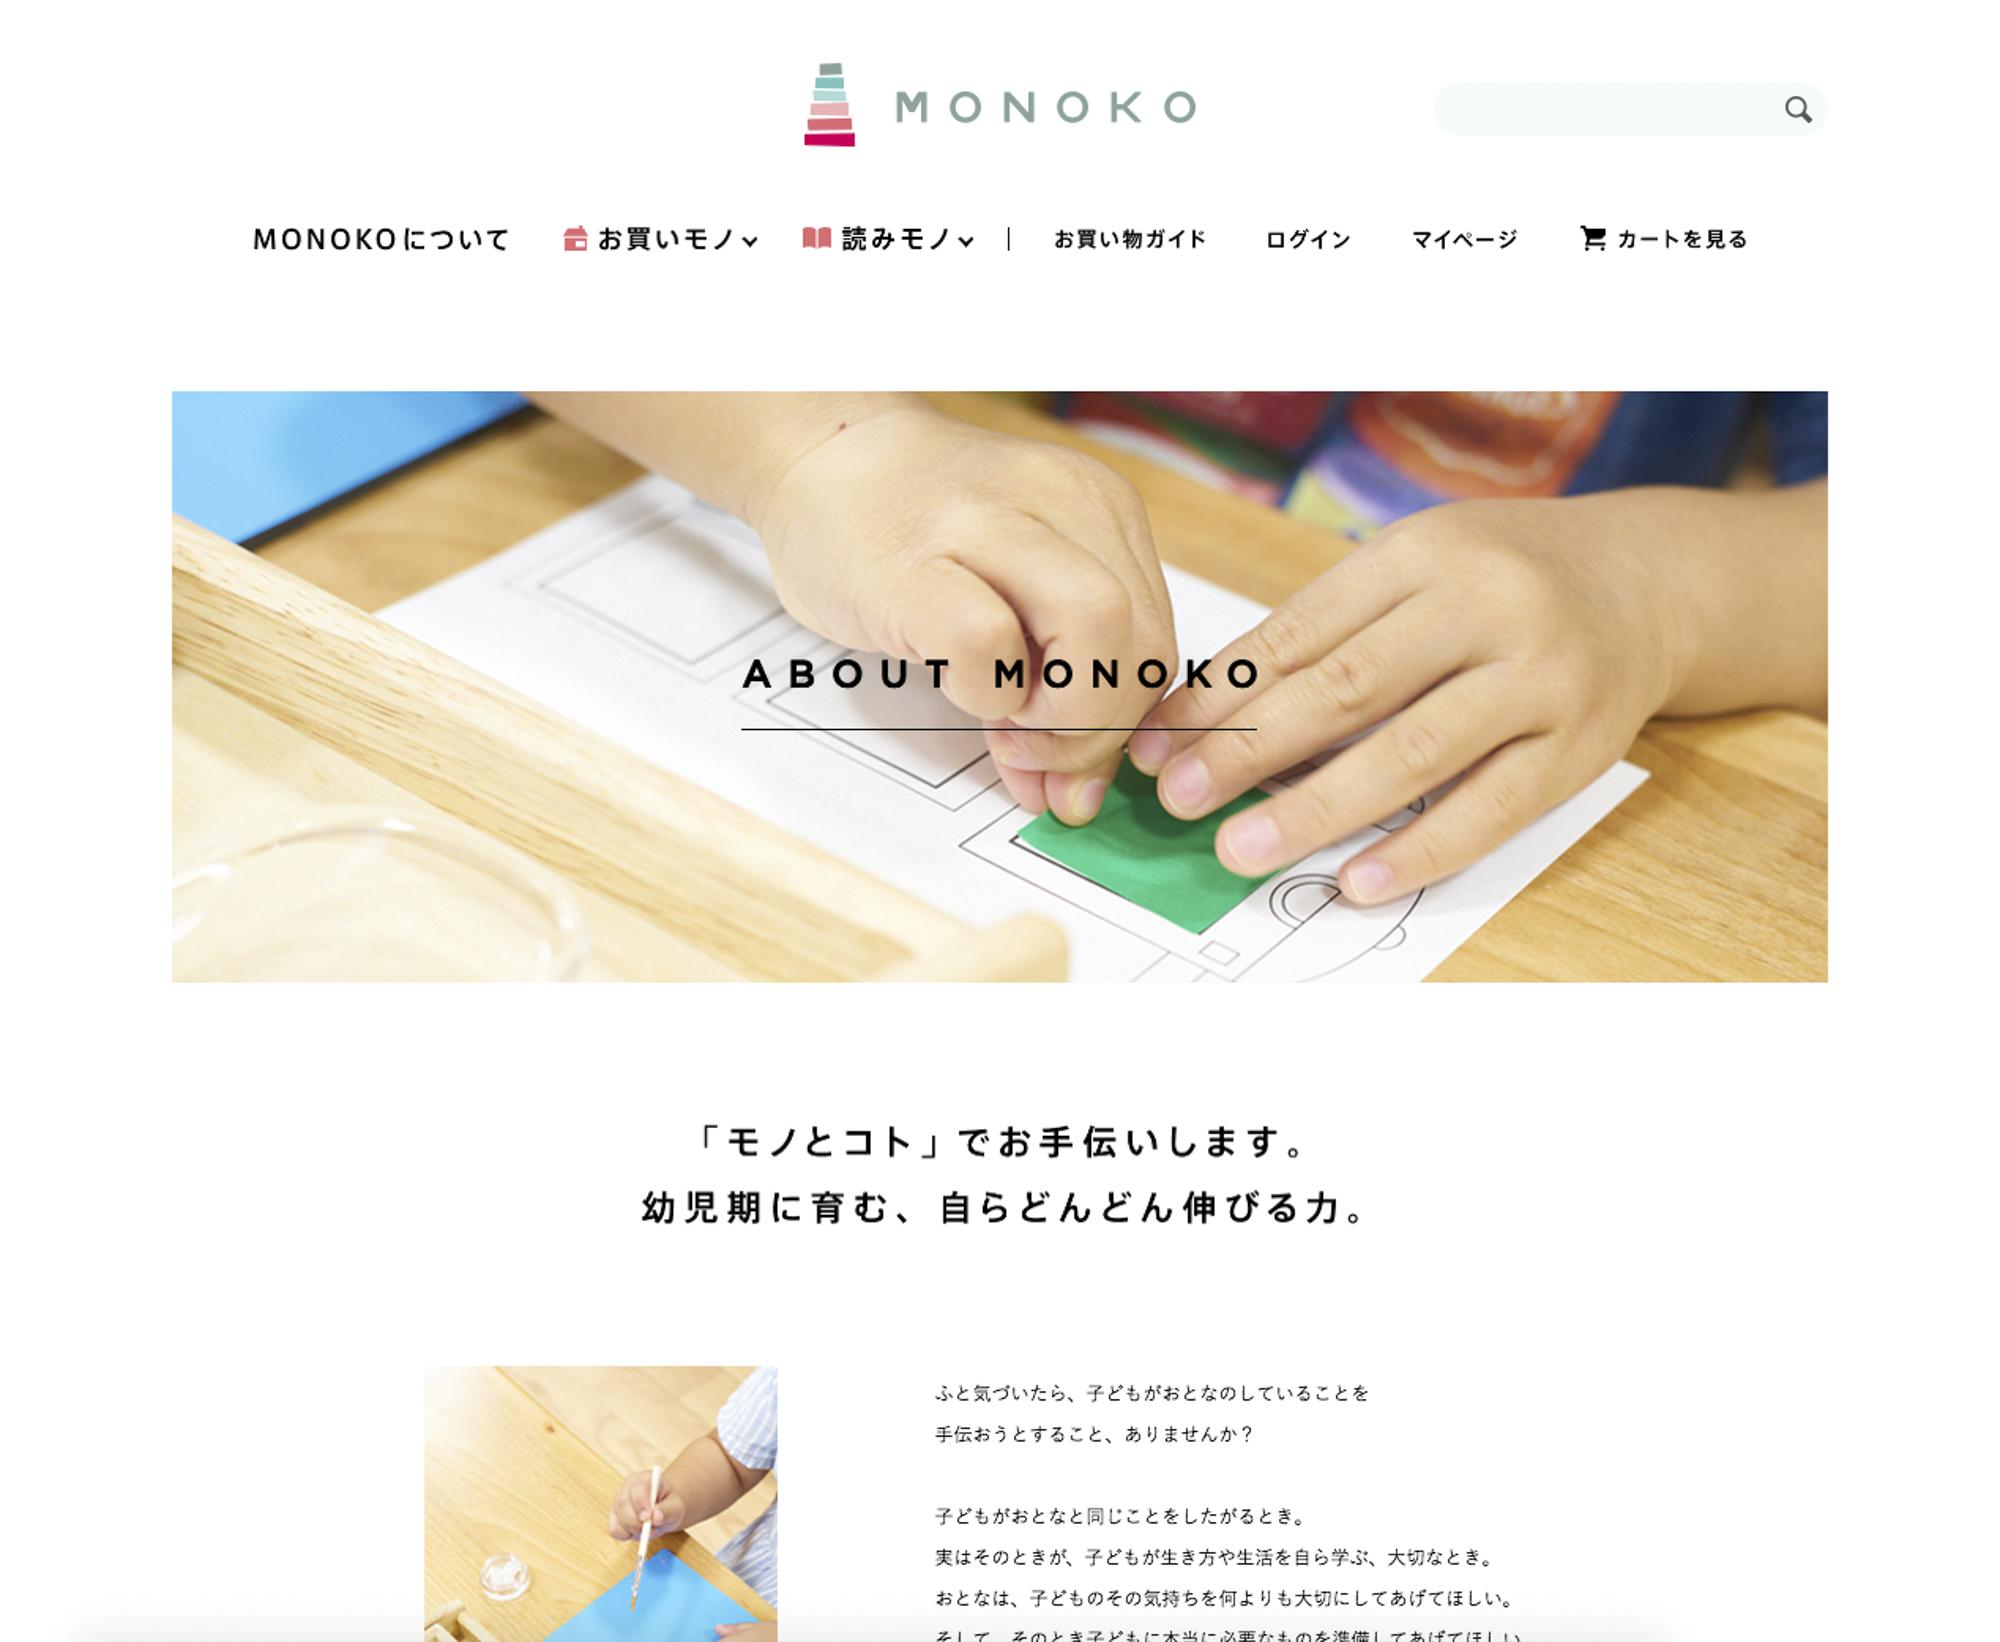 ICE幼児教室ショッピングサイト「MONOKO」